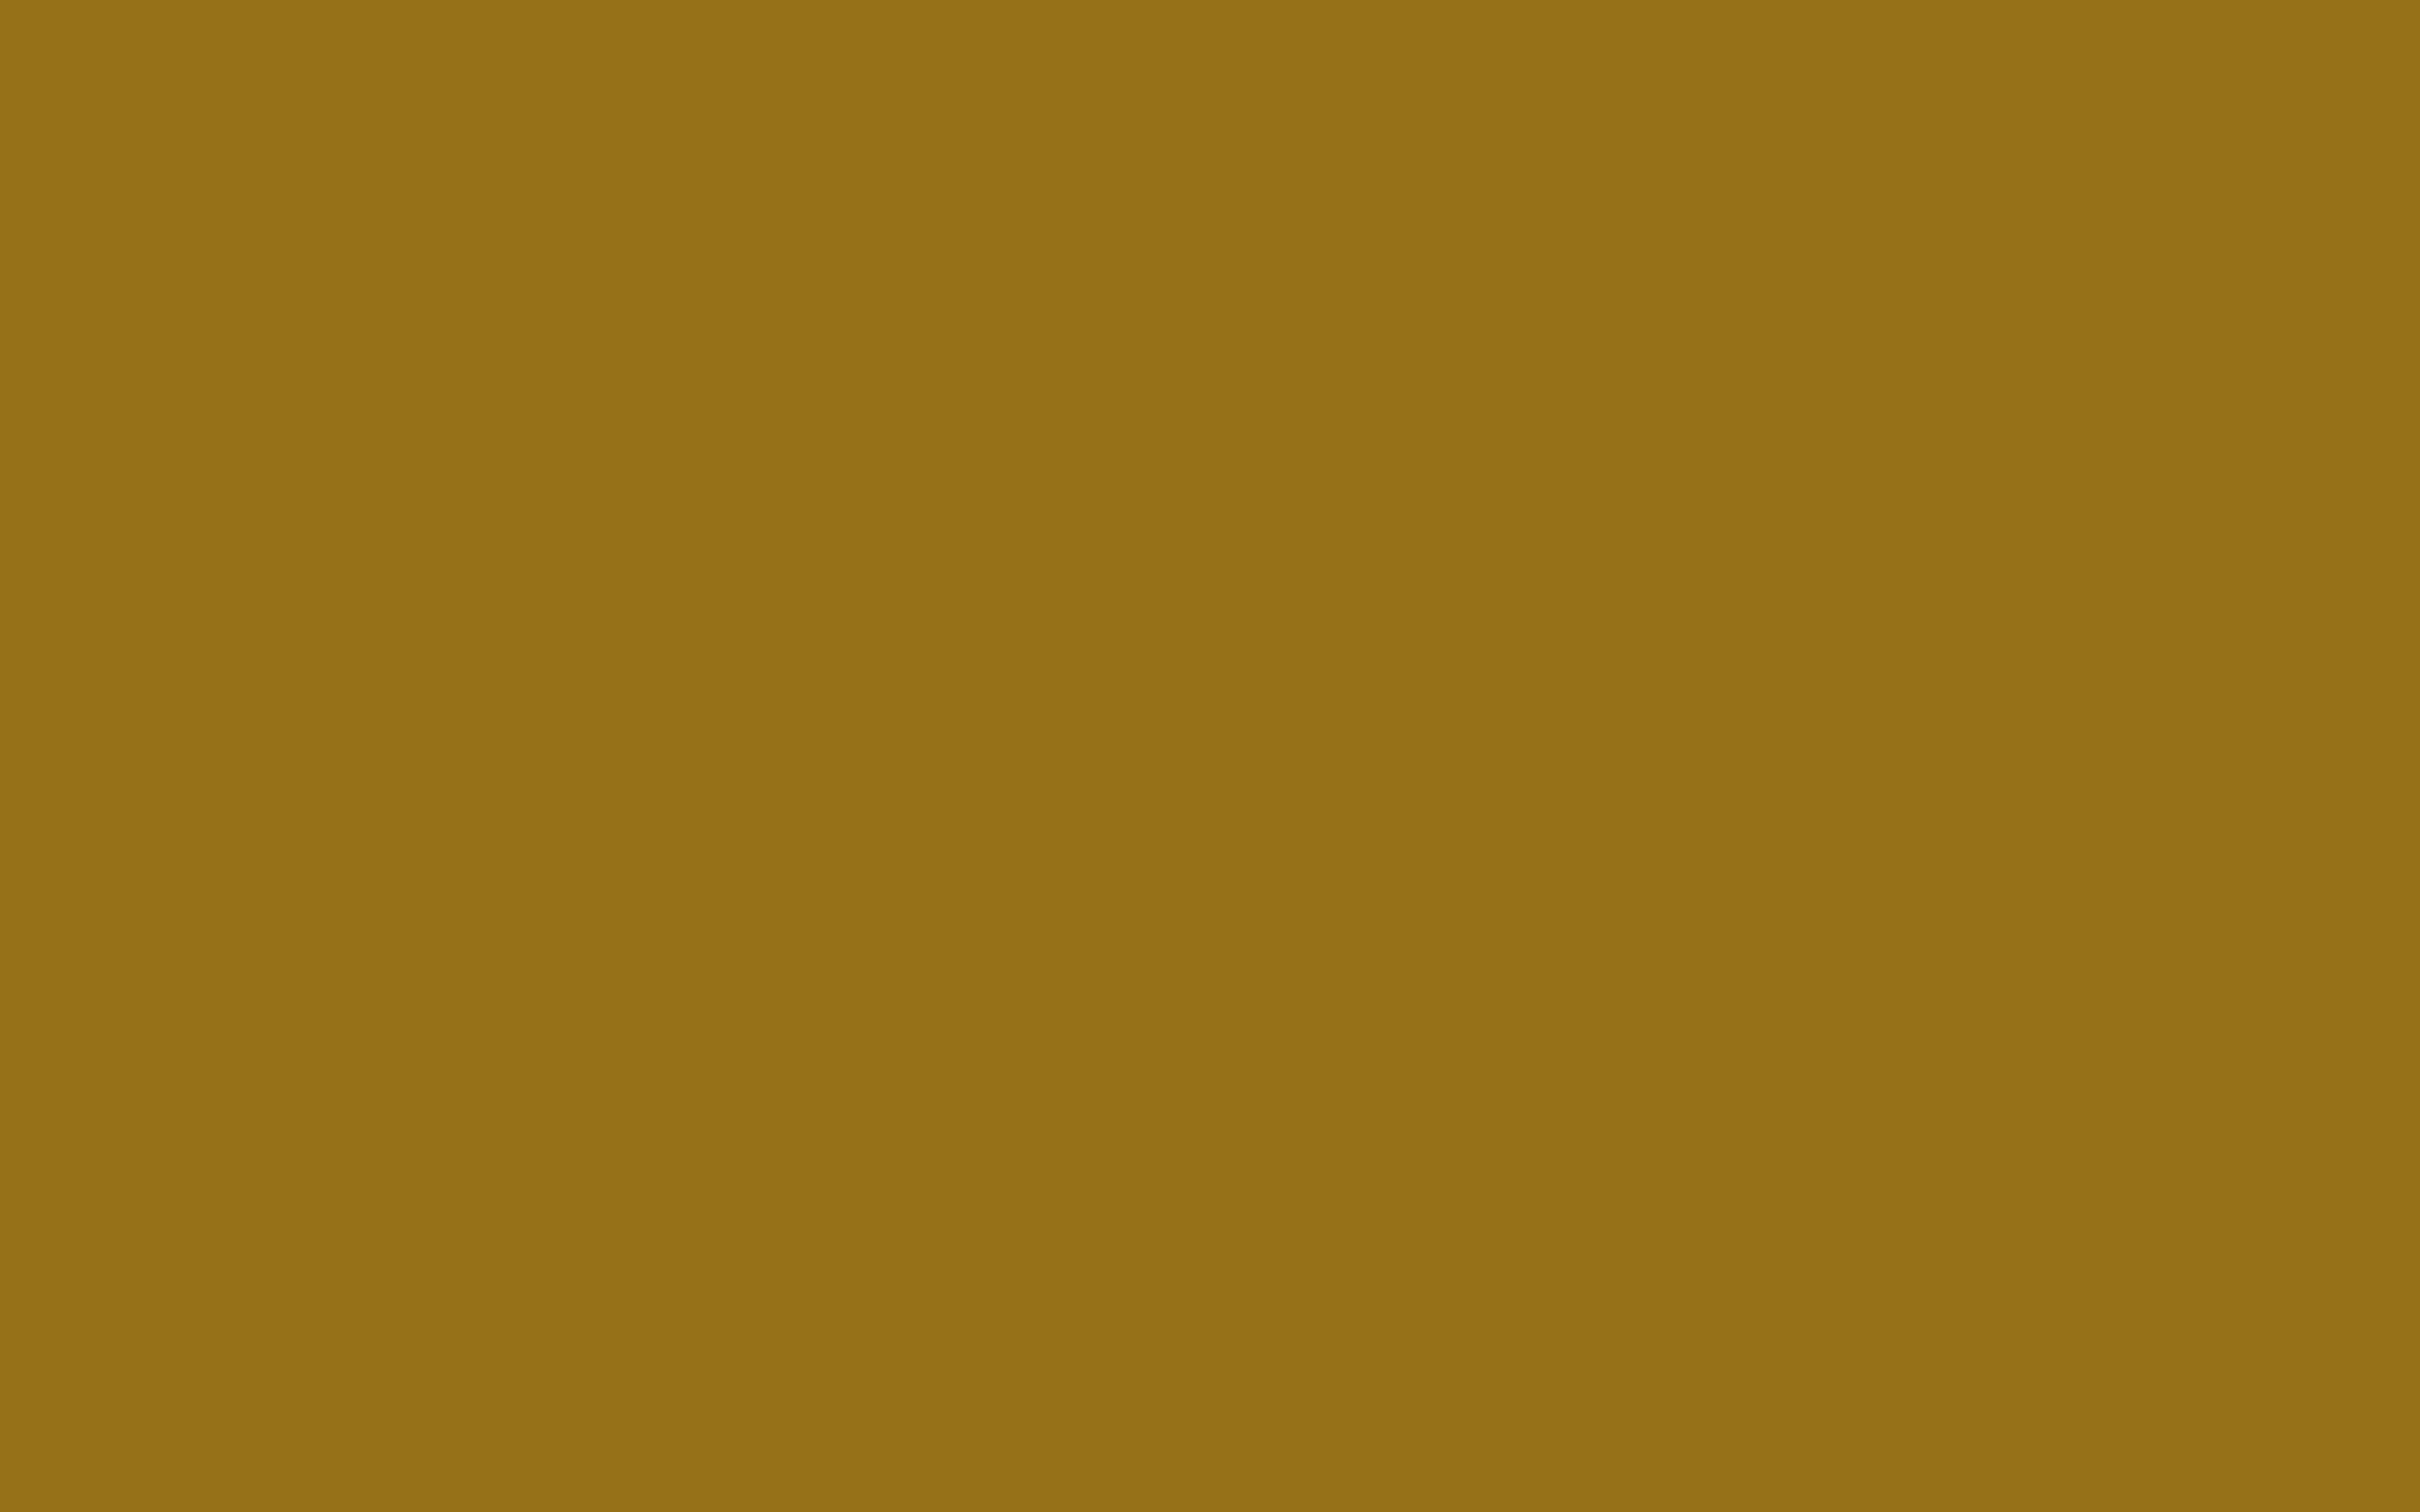 2560x1600 Bistre Brown Solid Color Background